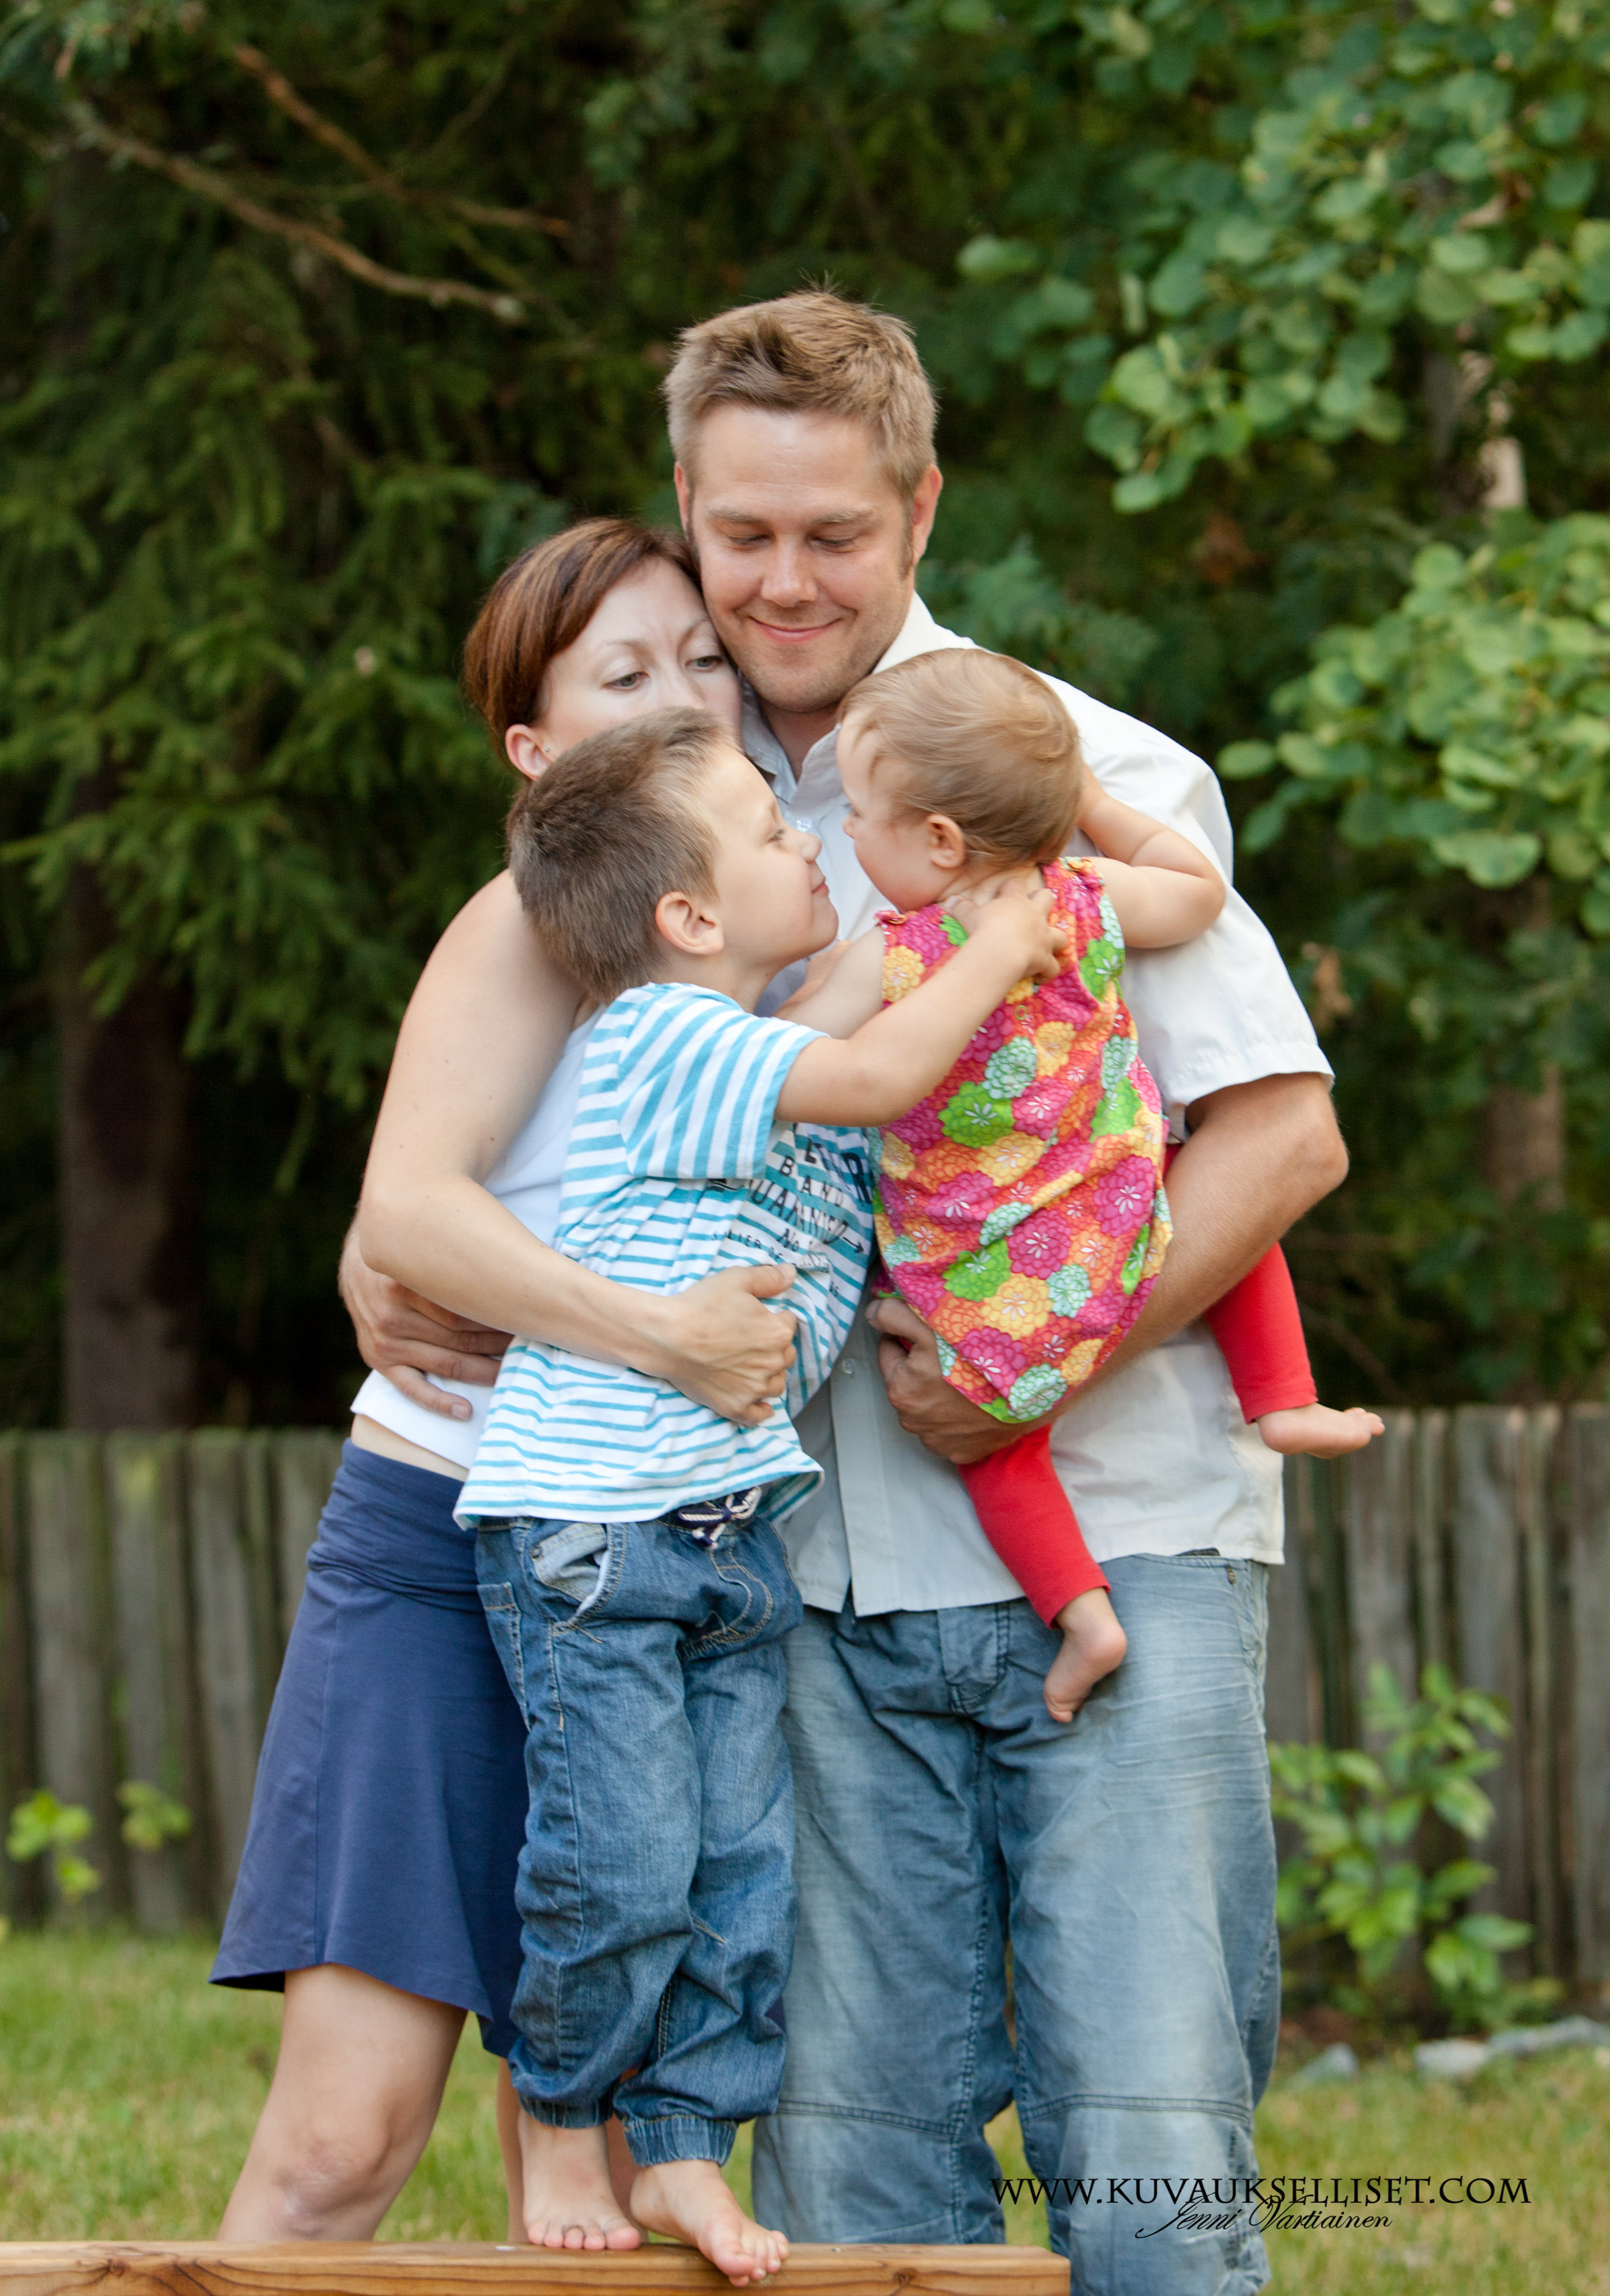 2014.8.13 lapsikuvaus miljöökuvaus perhekuvaus sisaruskuvaus family pictures child photoo (5 of 5)